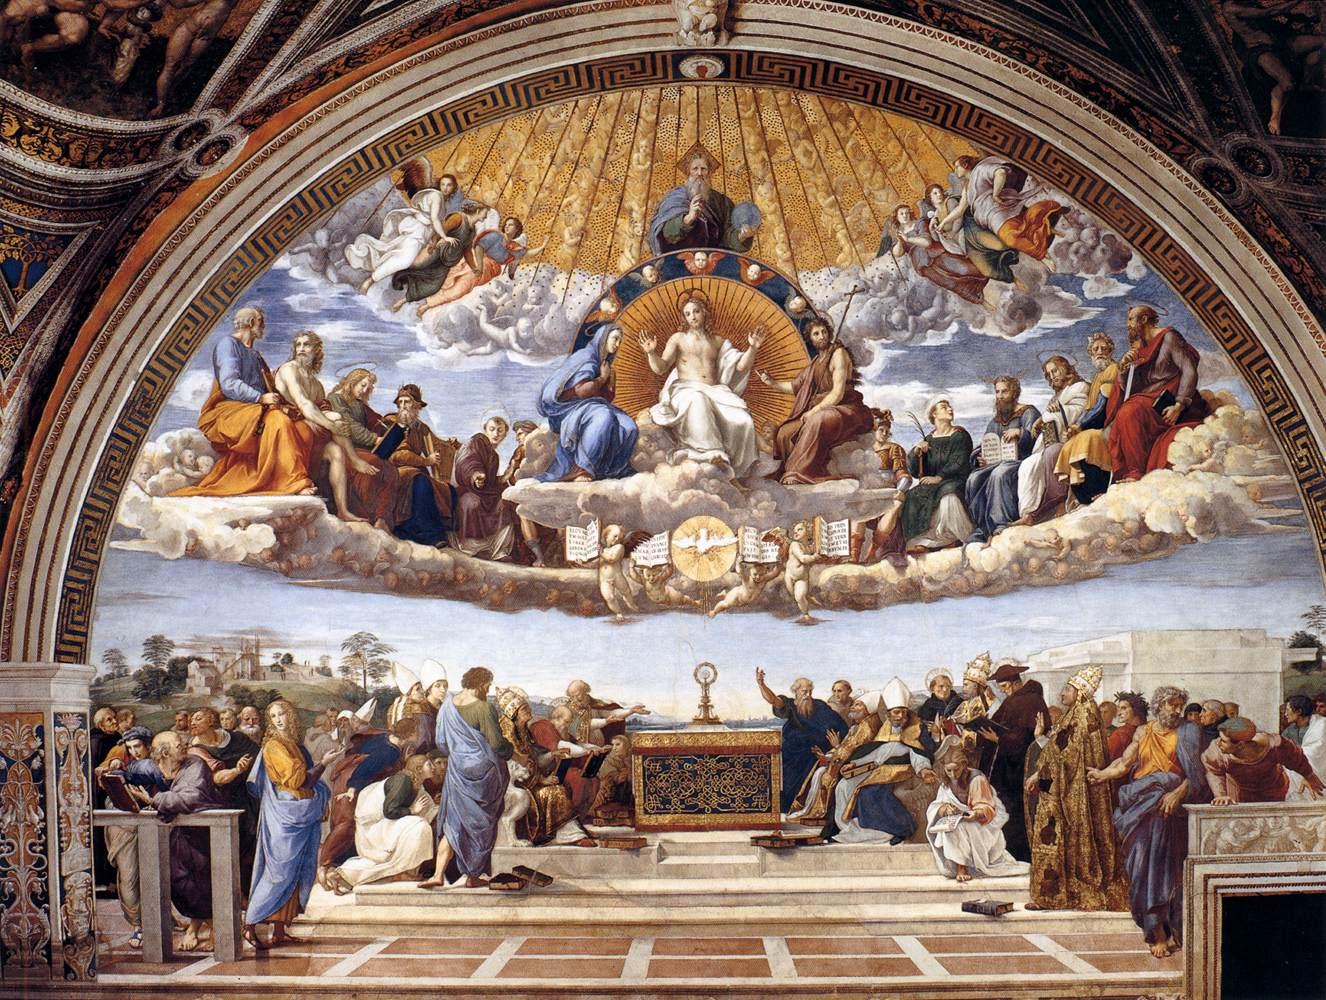 Raphael, Disputation of the Holy Sacrament, 1510